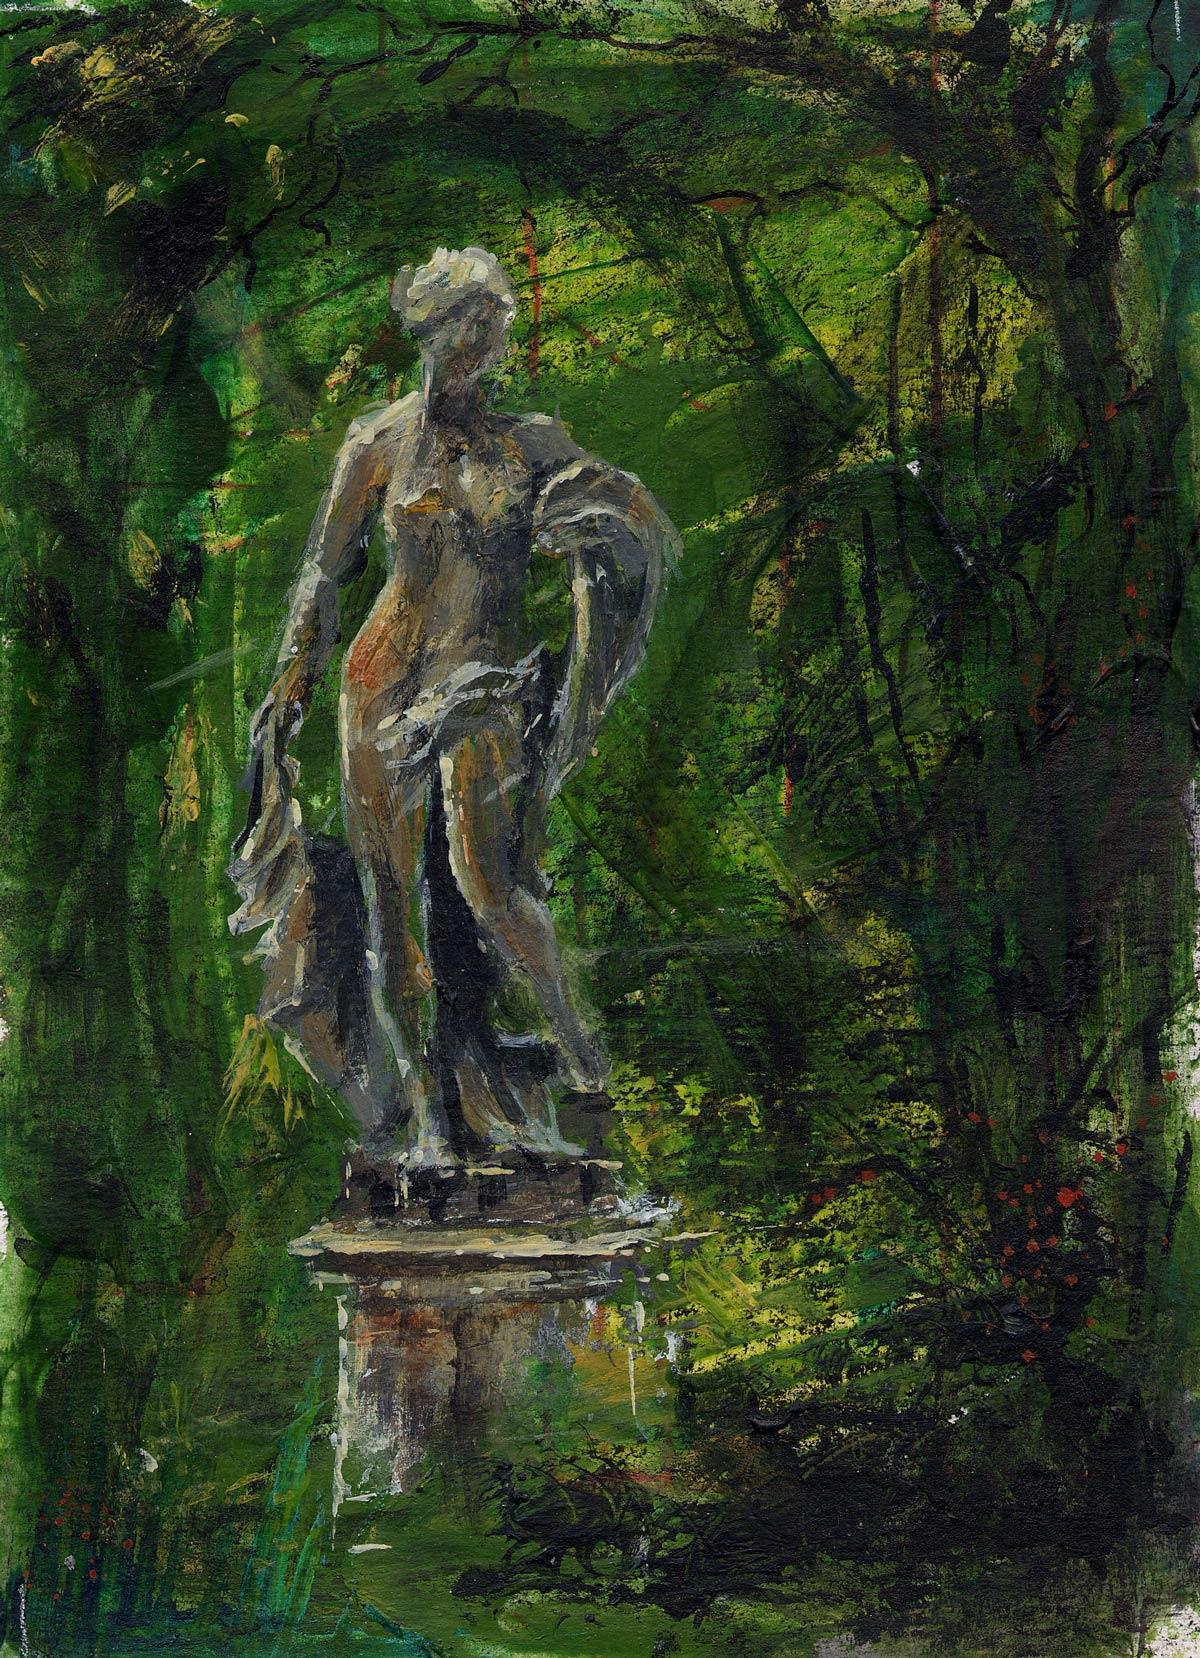 Statue in Hinton Ampner gardens I 17 x 13 cm